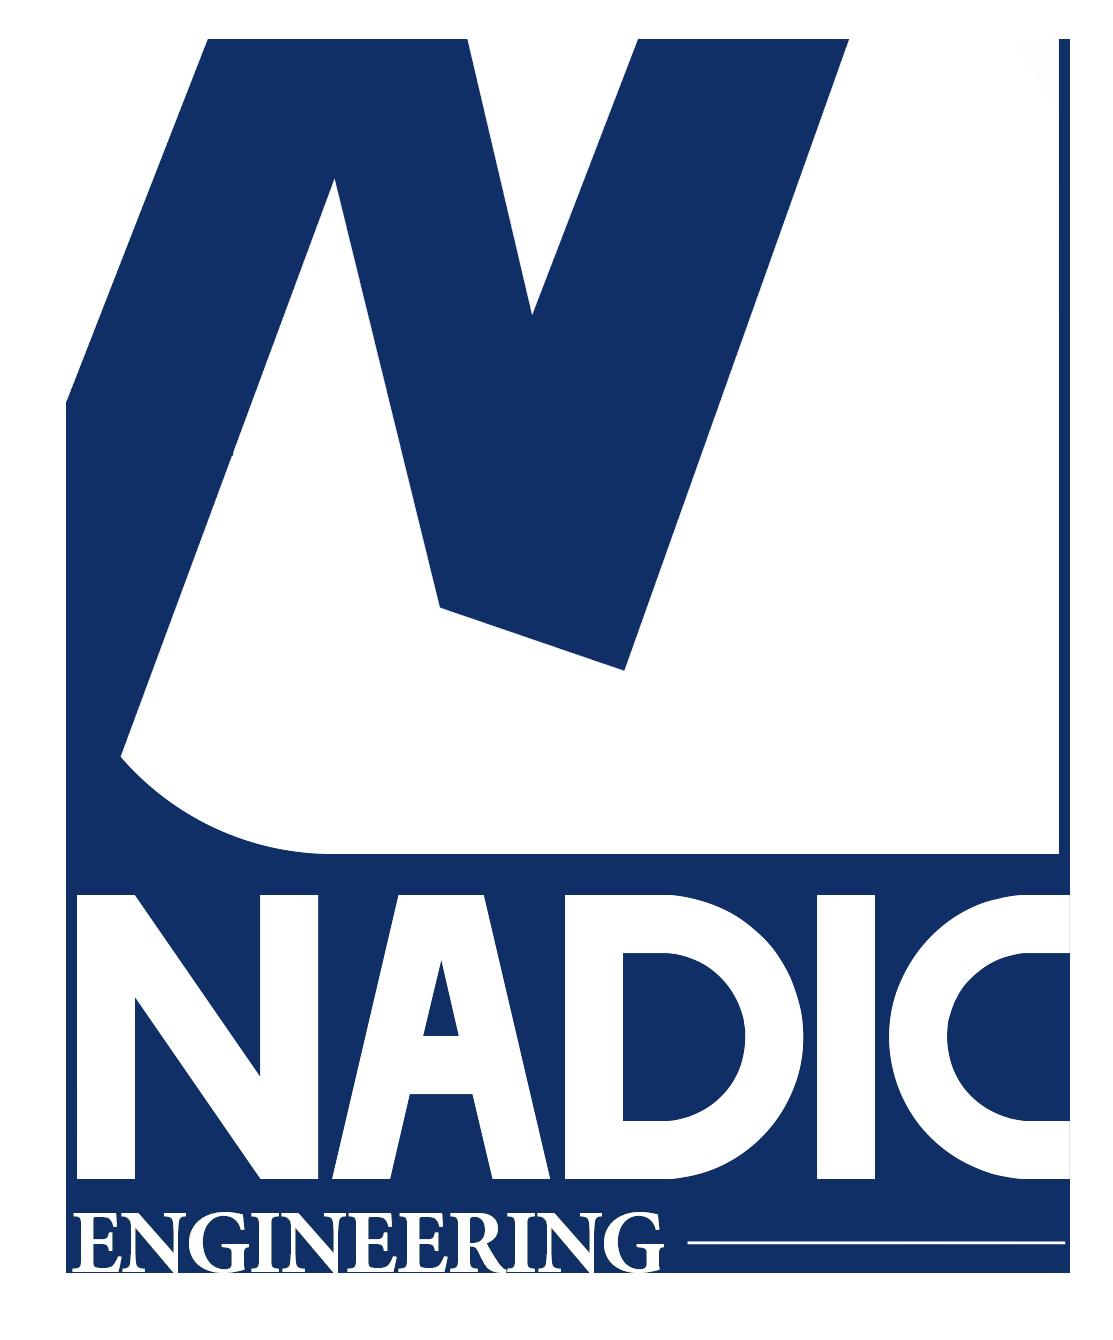 Nadic Engineering Services Inc